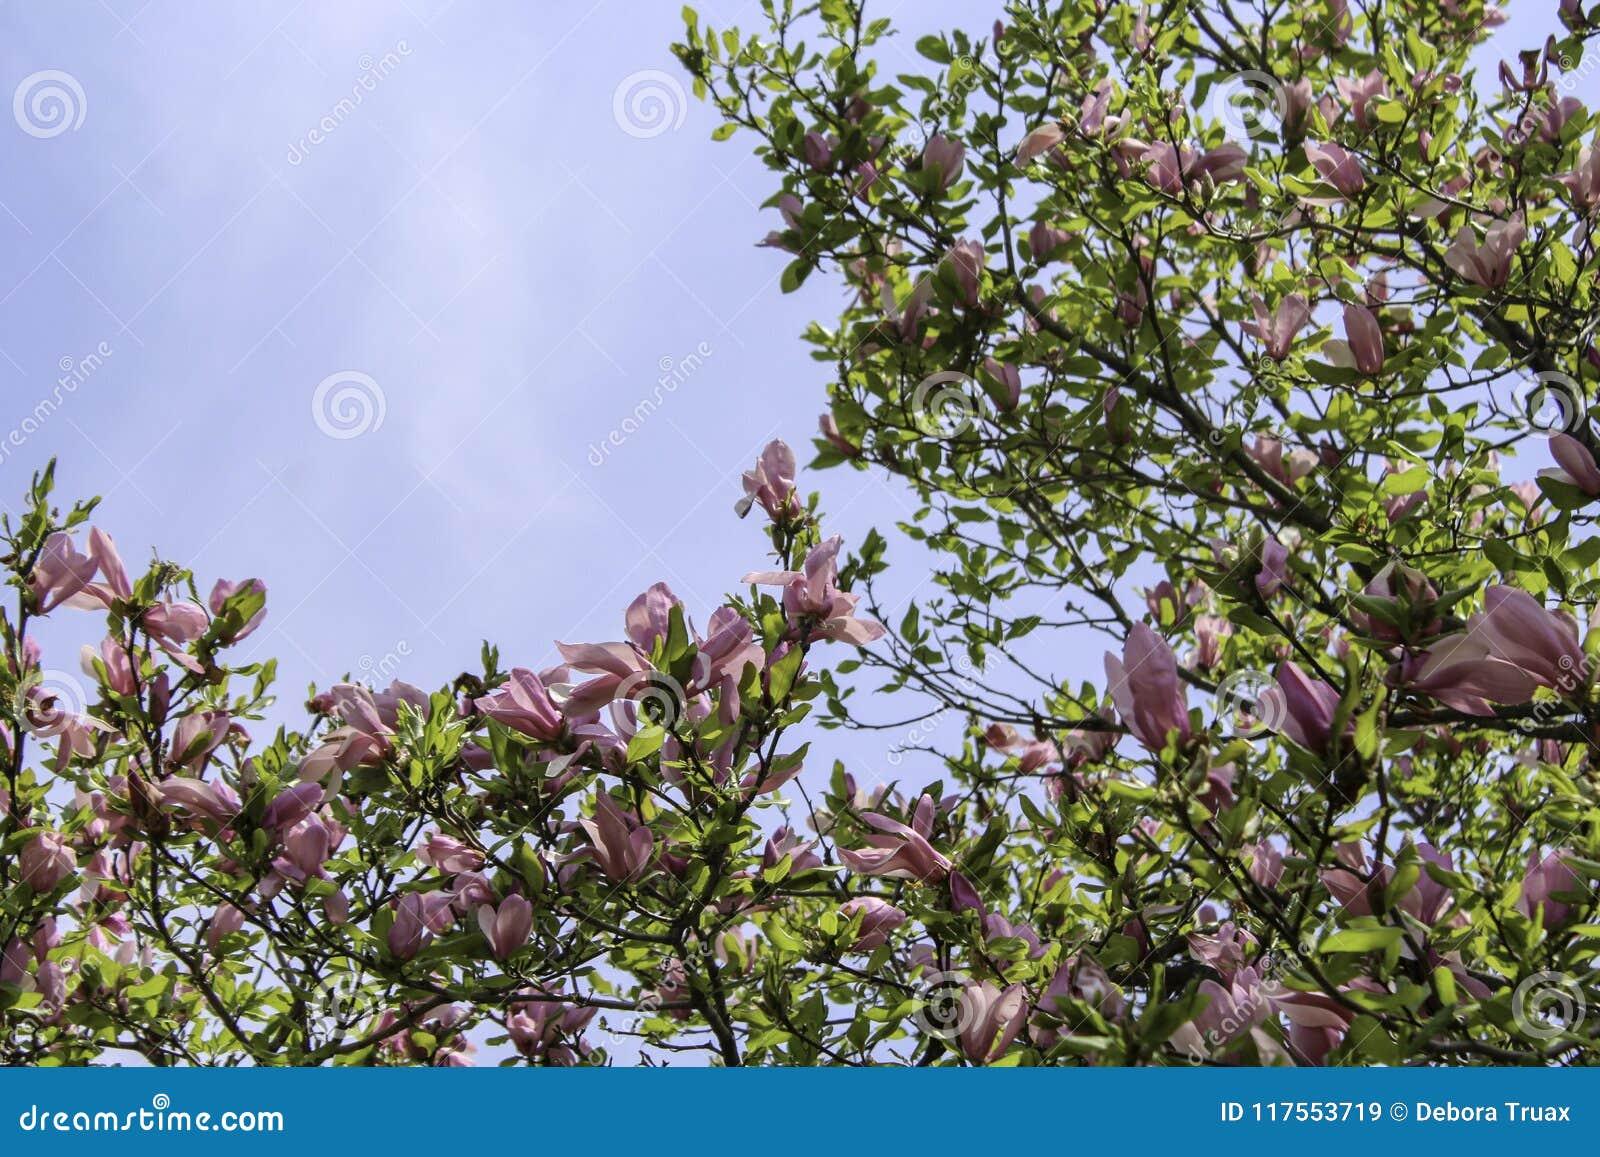 Dark pink magnolia flowers on tree branch stock image image of dark pink magnolia flowers on tree branch mightylinksfo